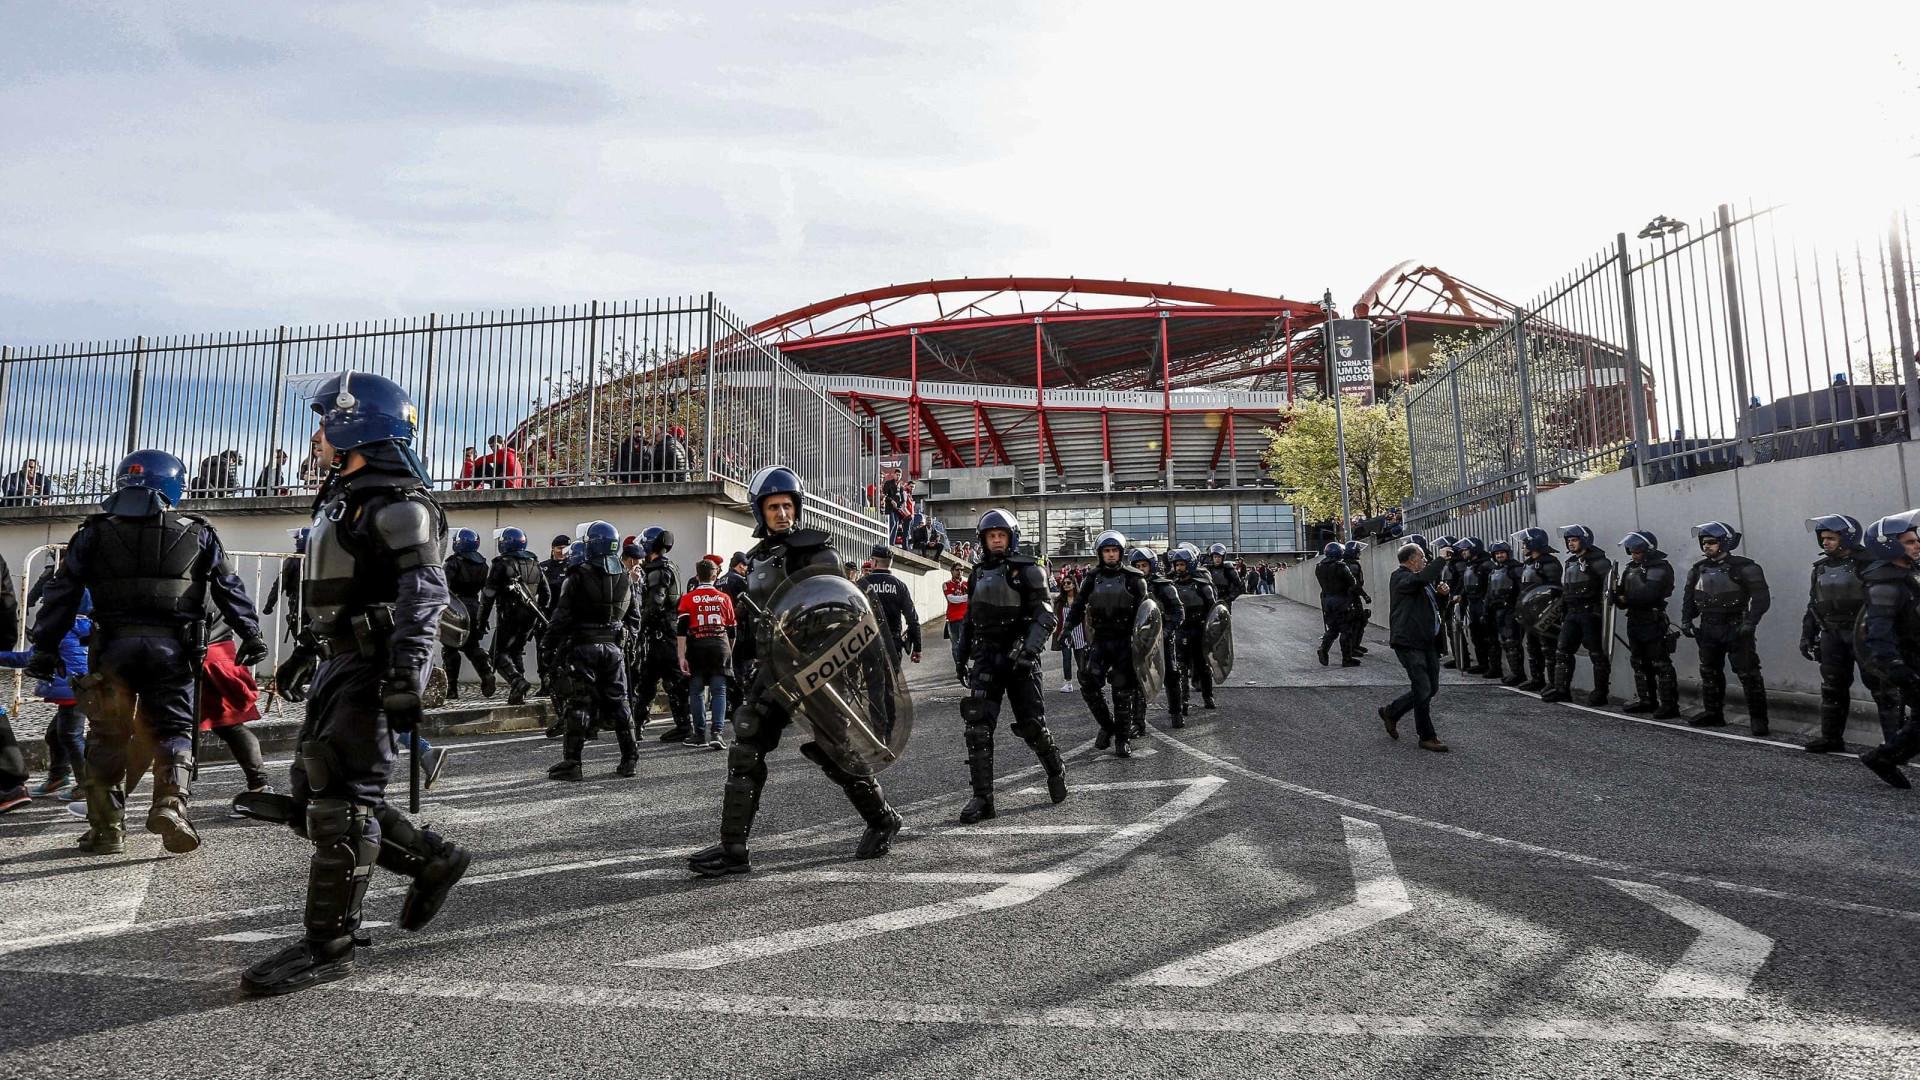 Carga policial no Estádio da Luz. Seis polícias feridos